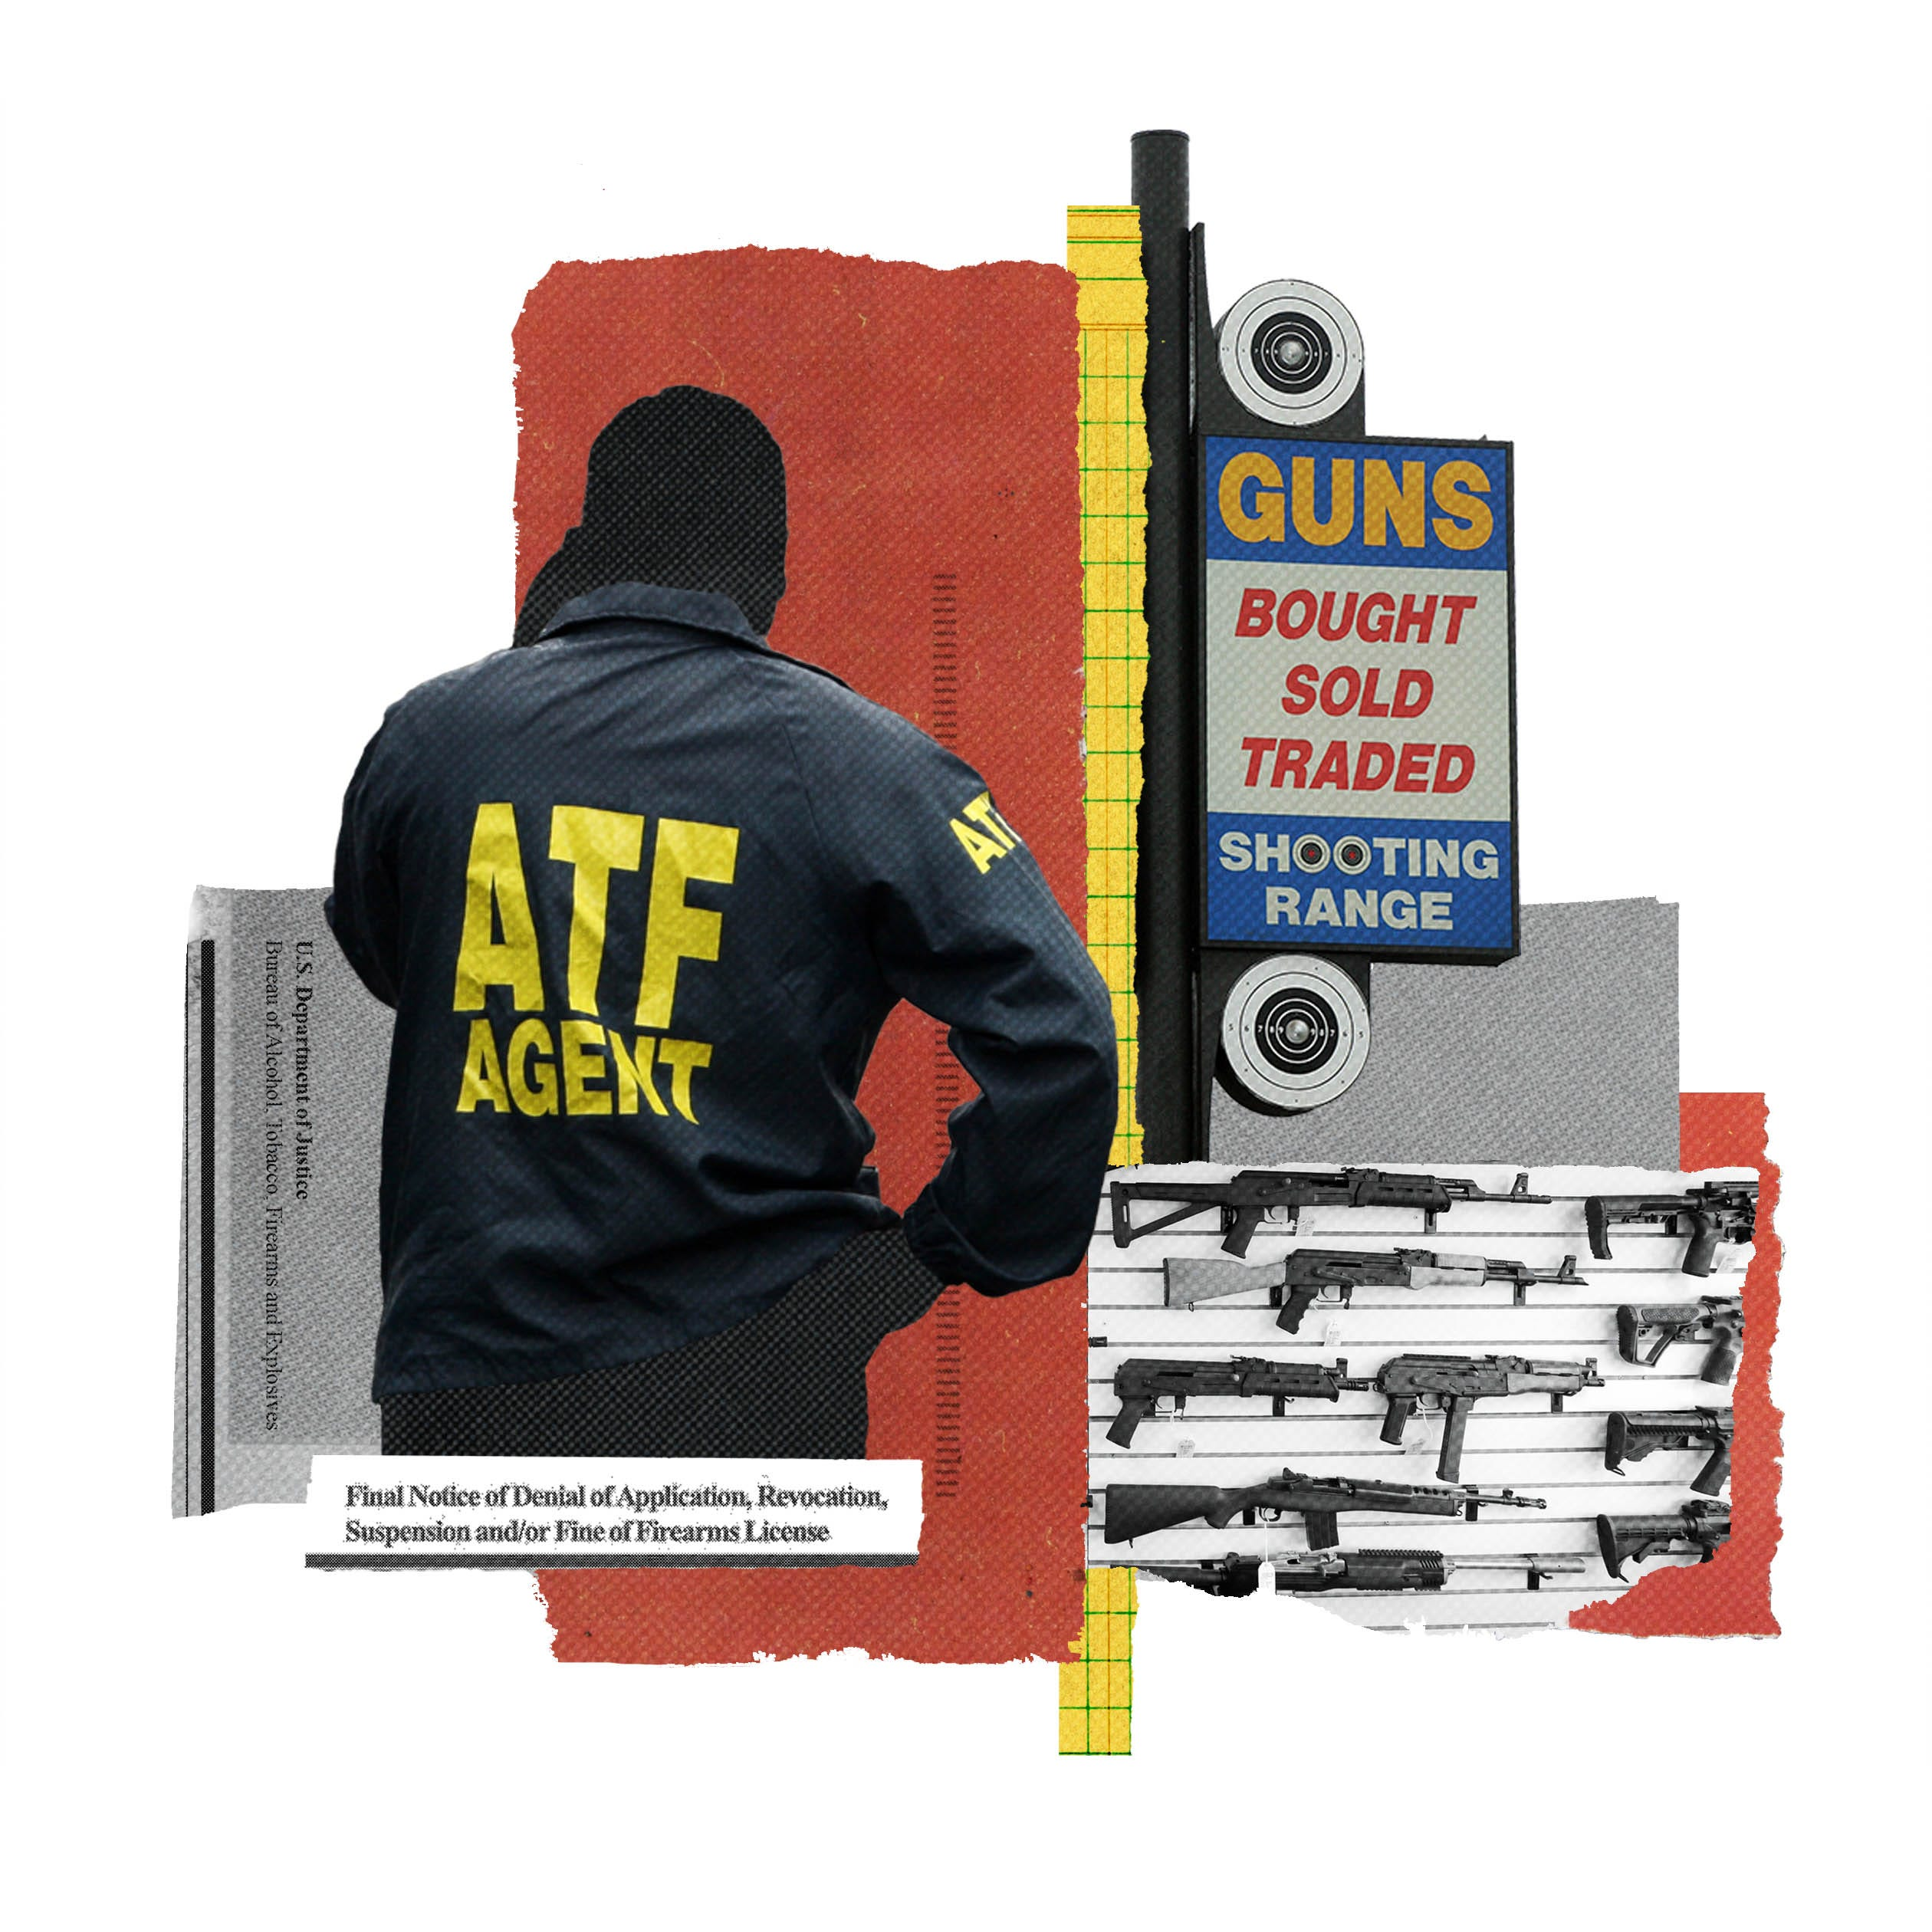 ATF illustration